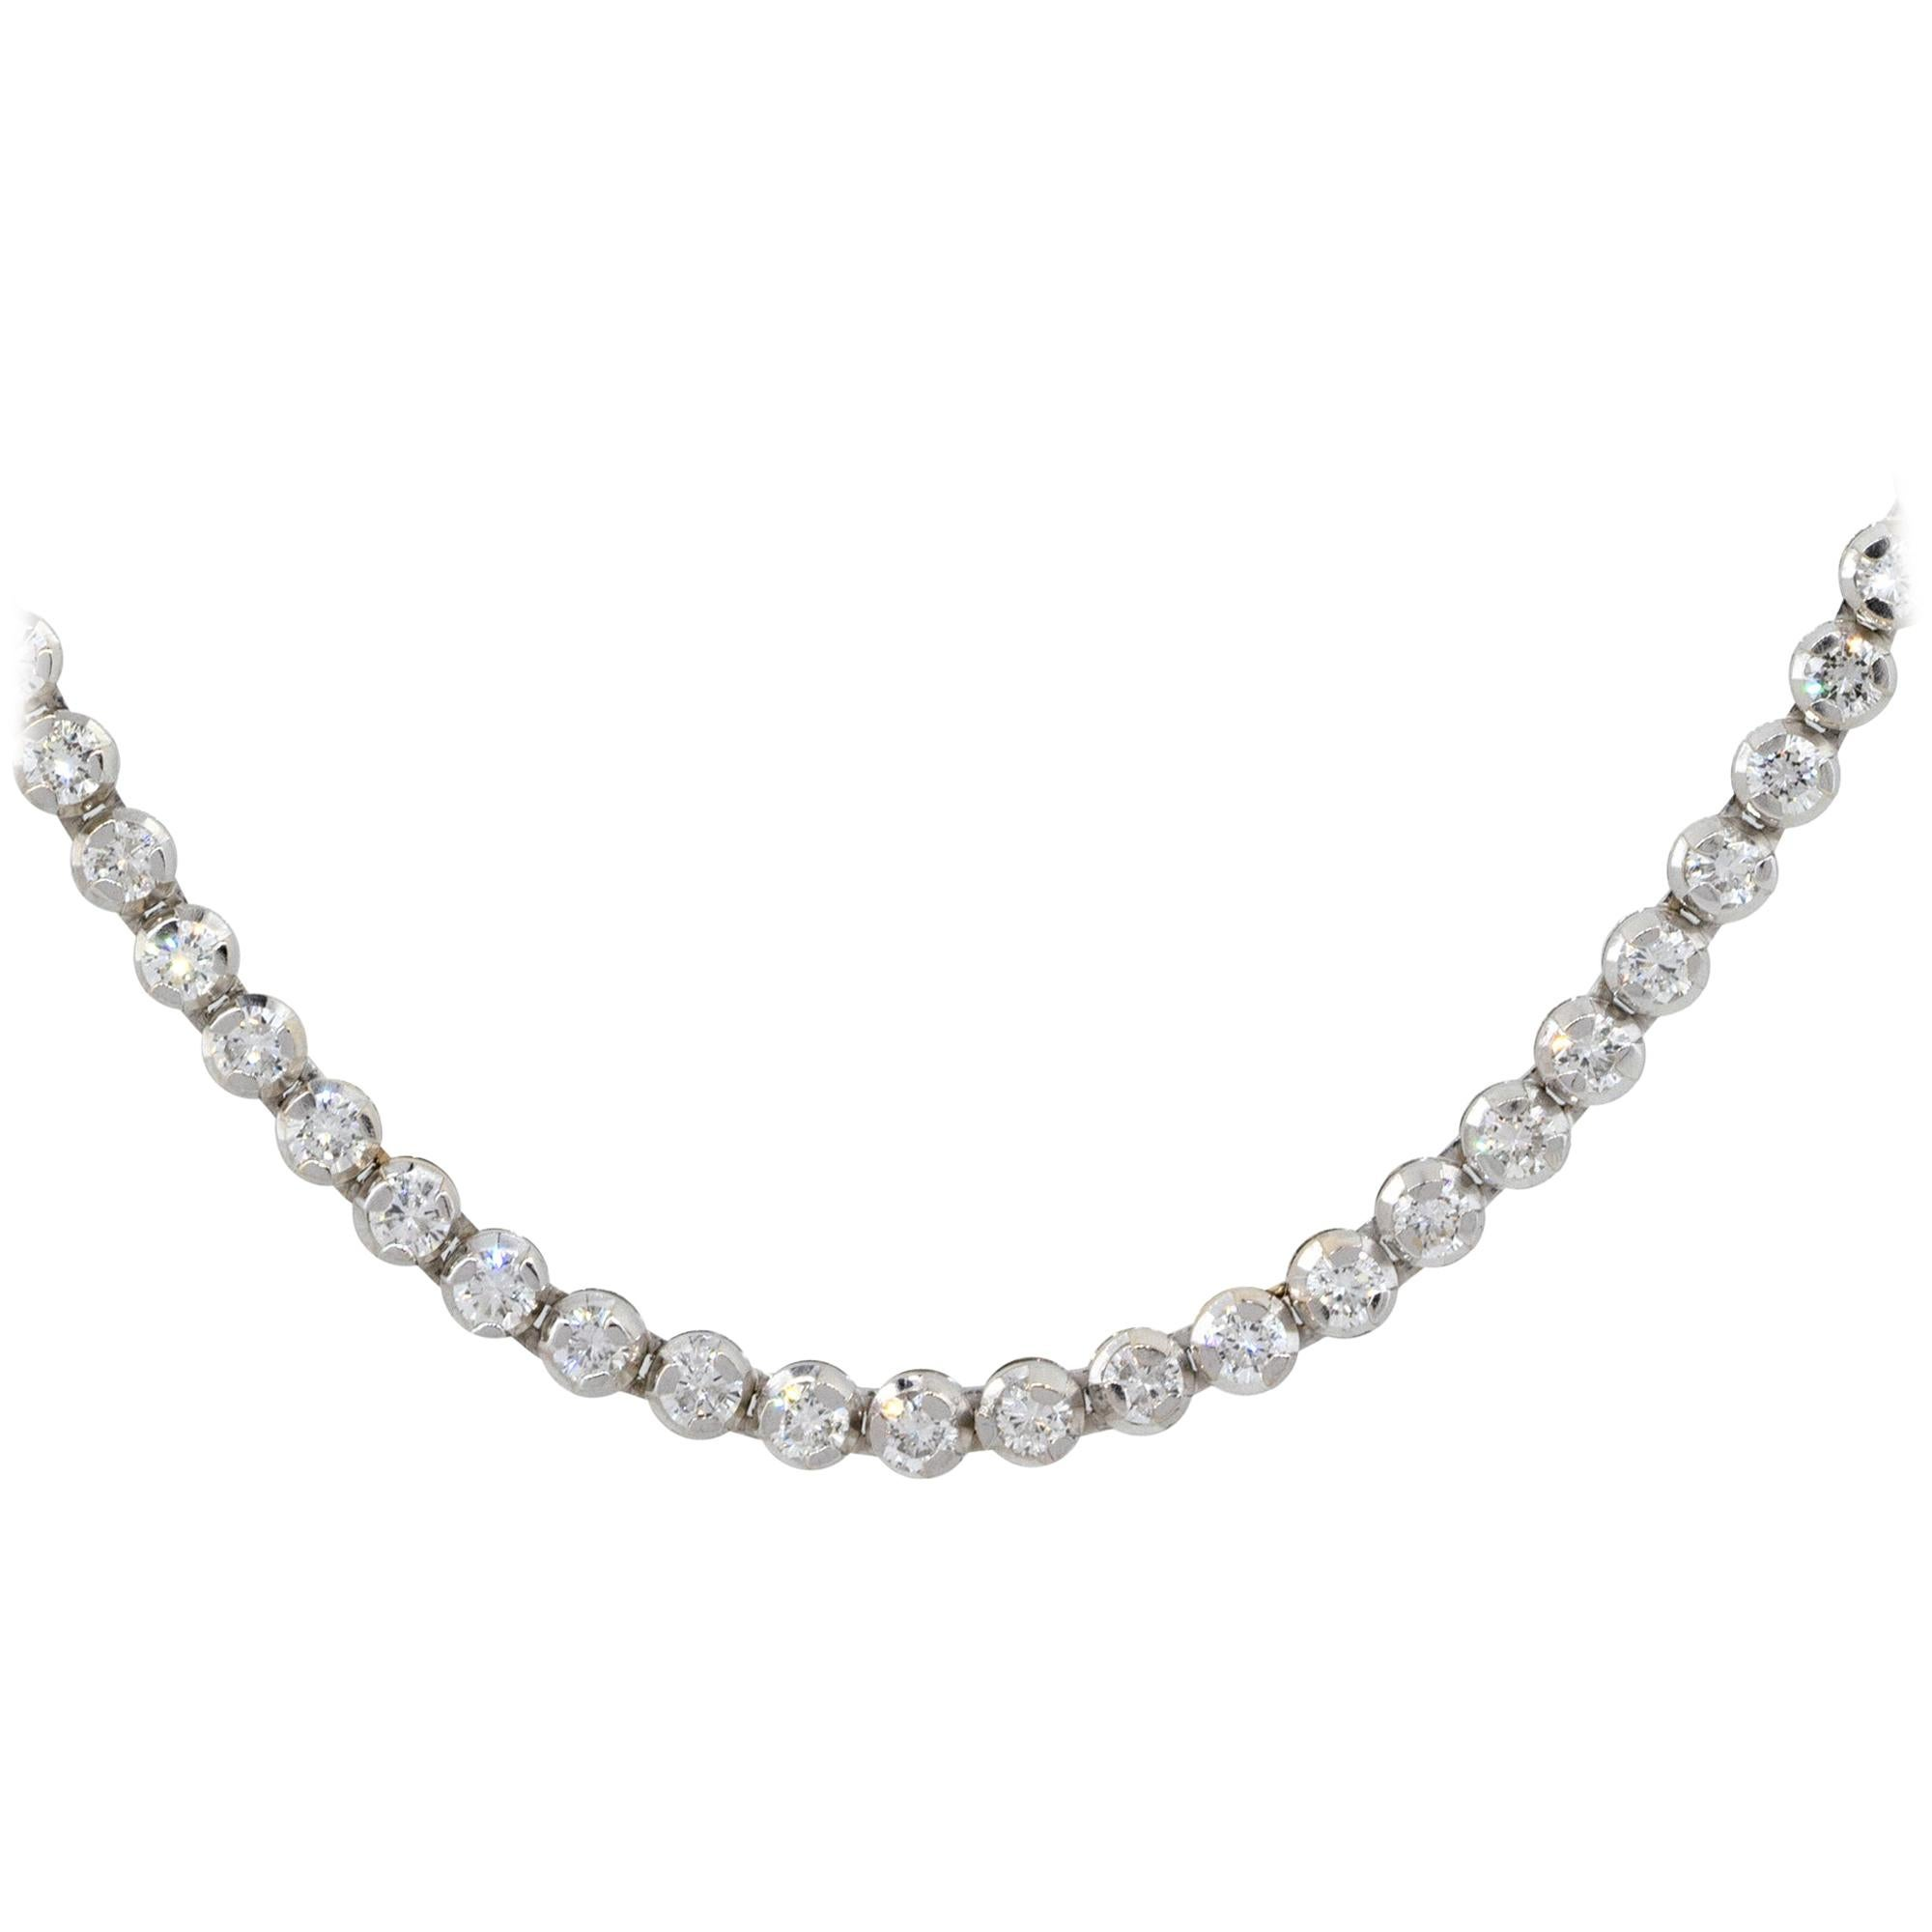 3.65 Carat Round Diamond Tennis Necklace 18 Karat in Stock